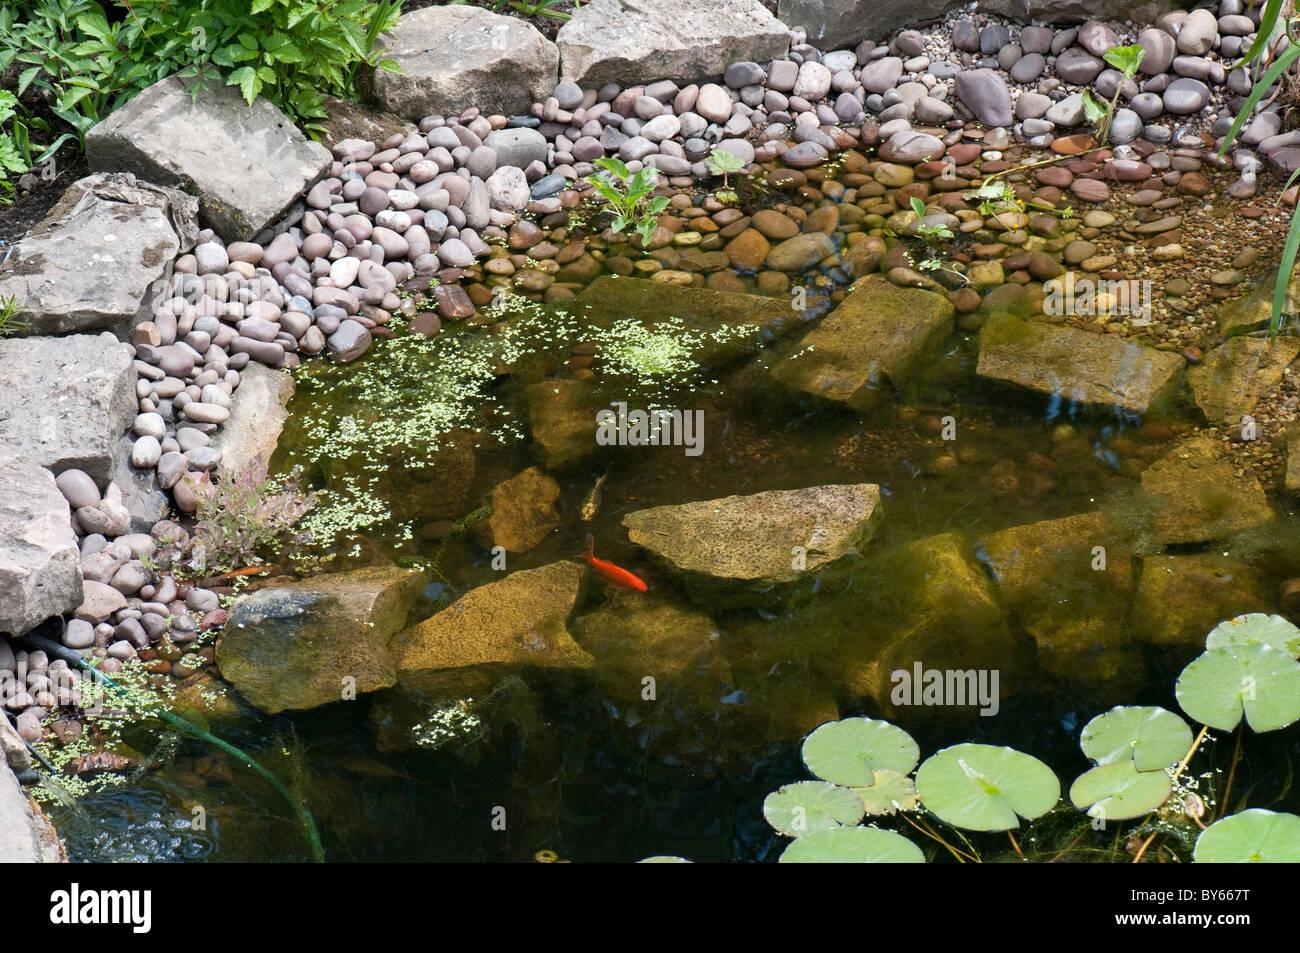 Small Garden Pond Stock Photos & Small Garden Pond Stock Images - Alamy